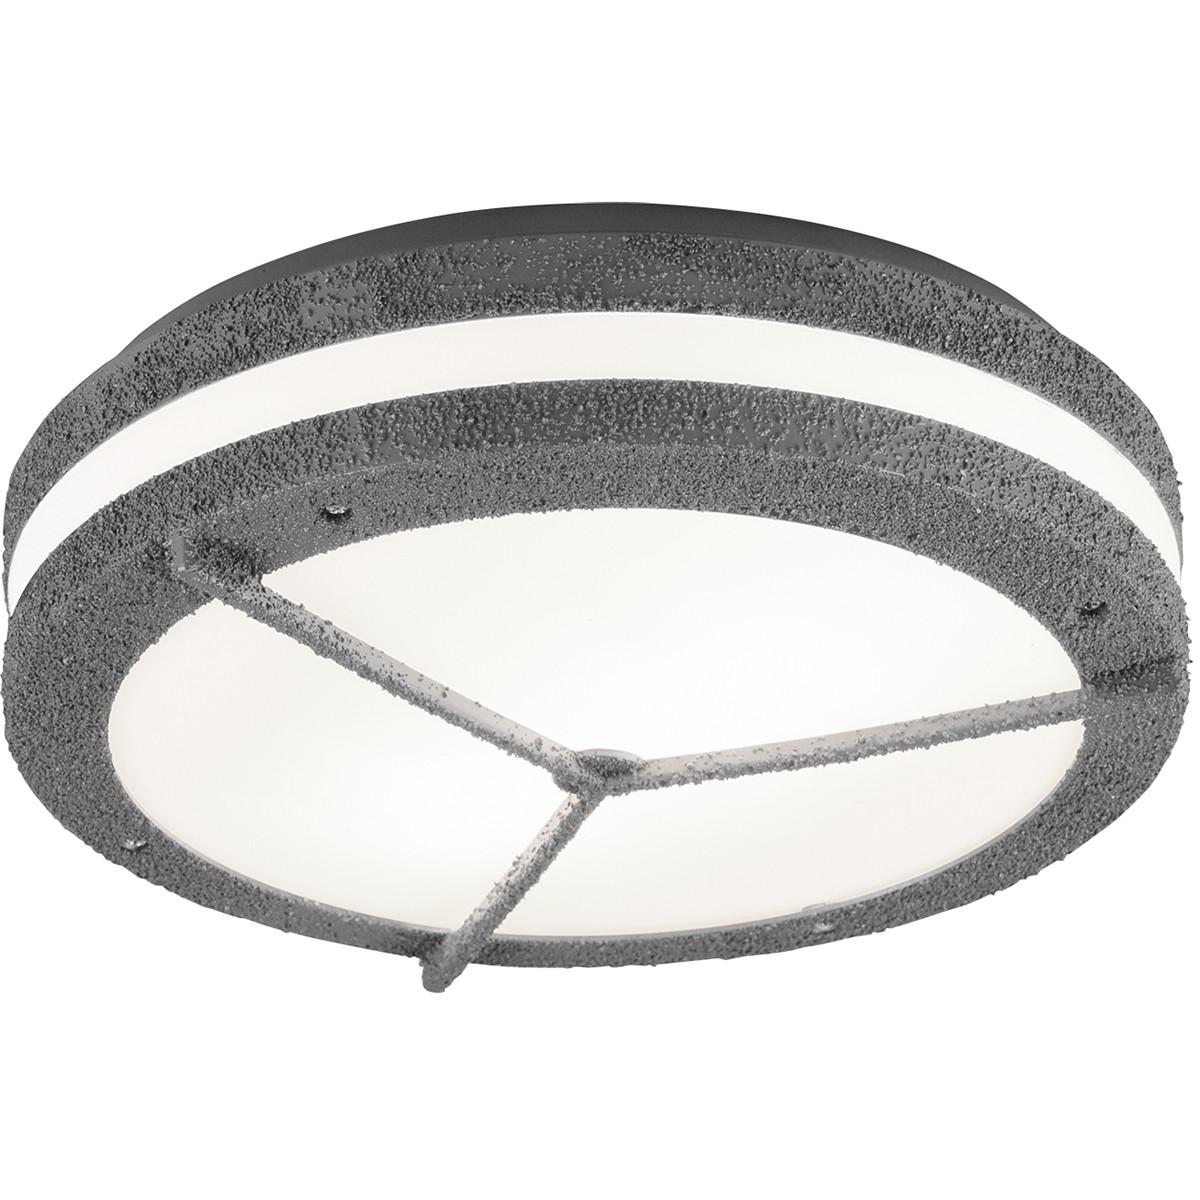 LED Plafondlamp - Trion Murinay - Opbouw Rond - Waterdicht IP54 - E27 Fitting - 2-lichts - Beton Loo